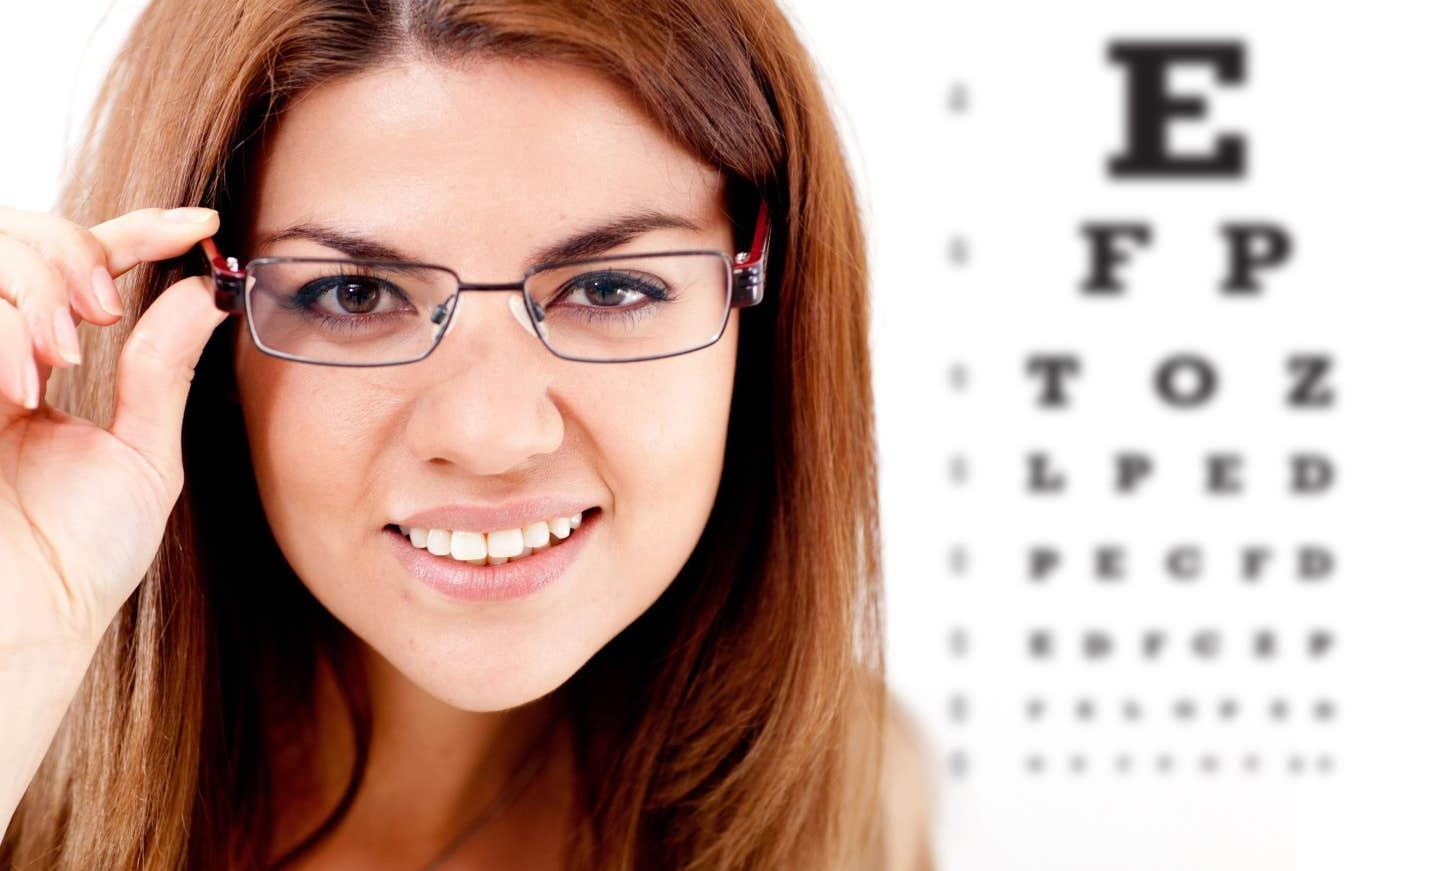 Metal Eyeglass Frames